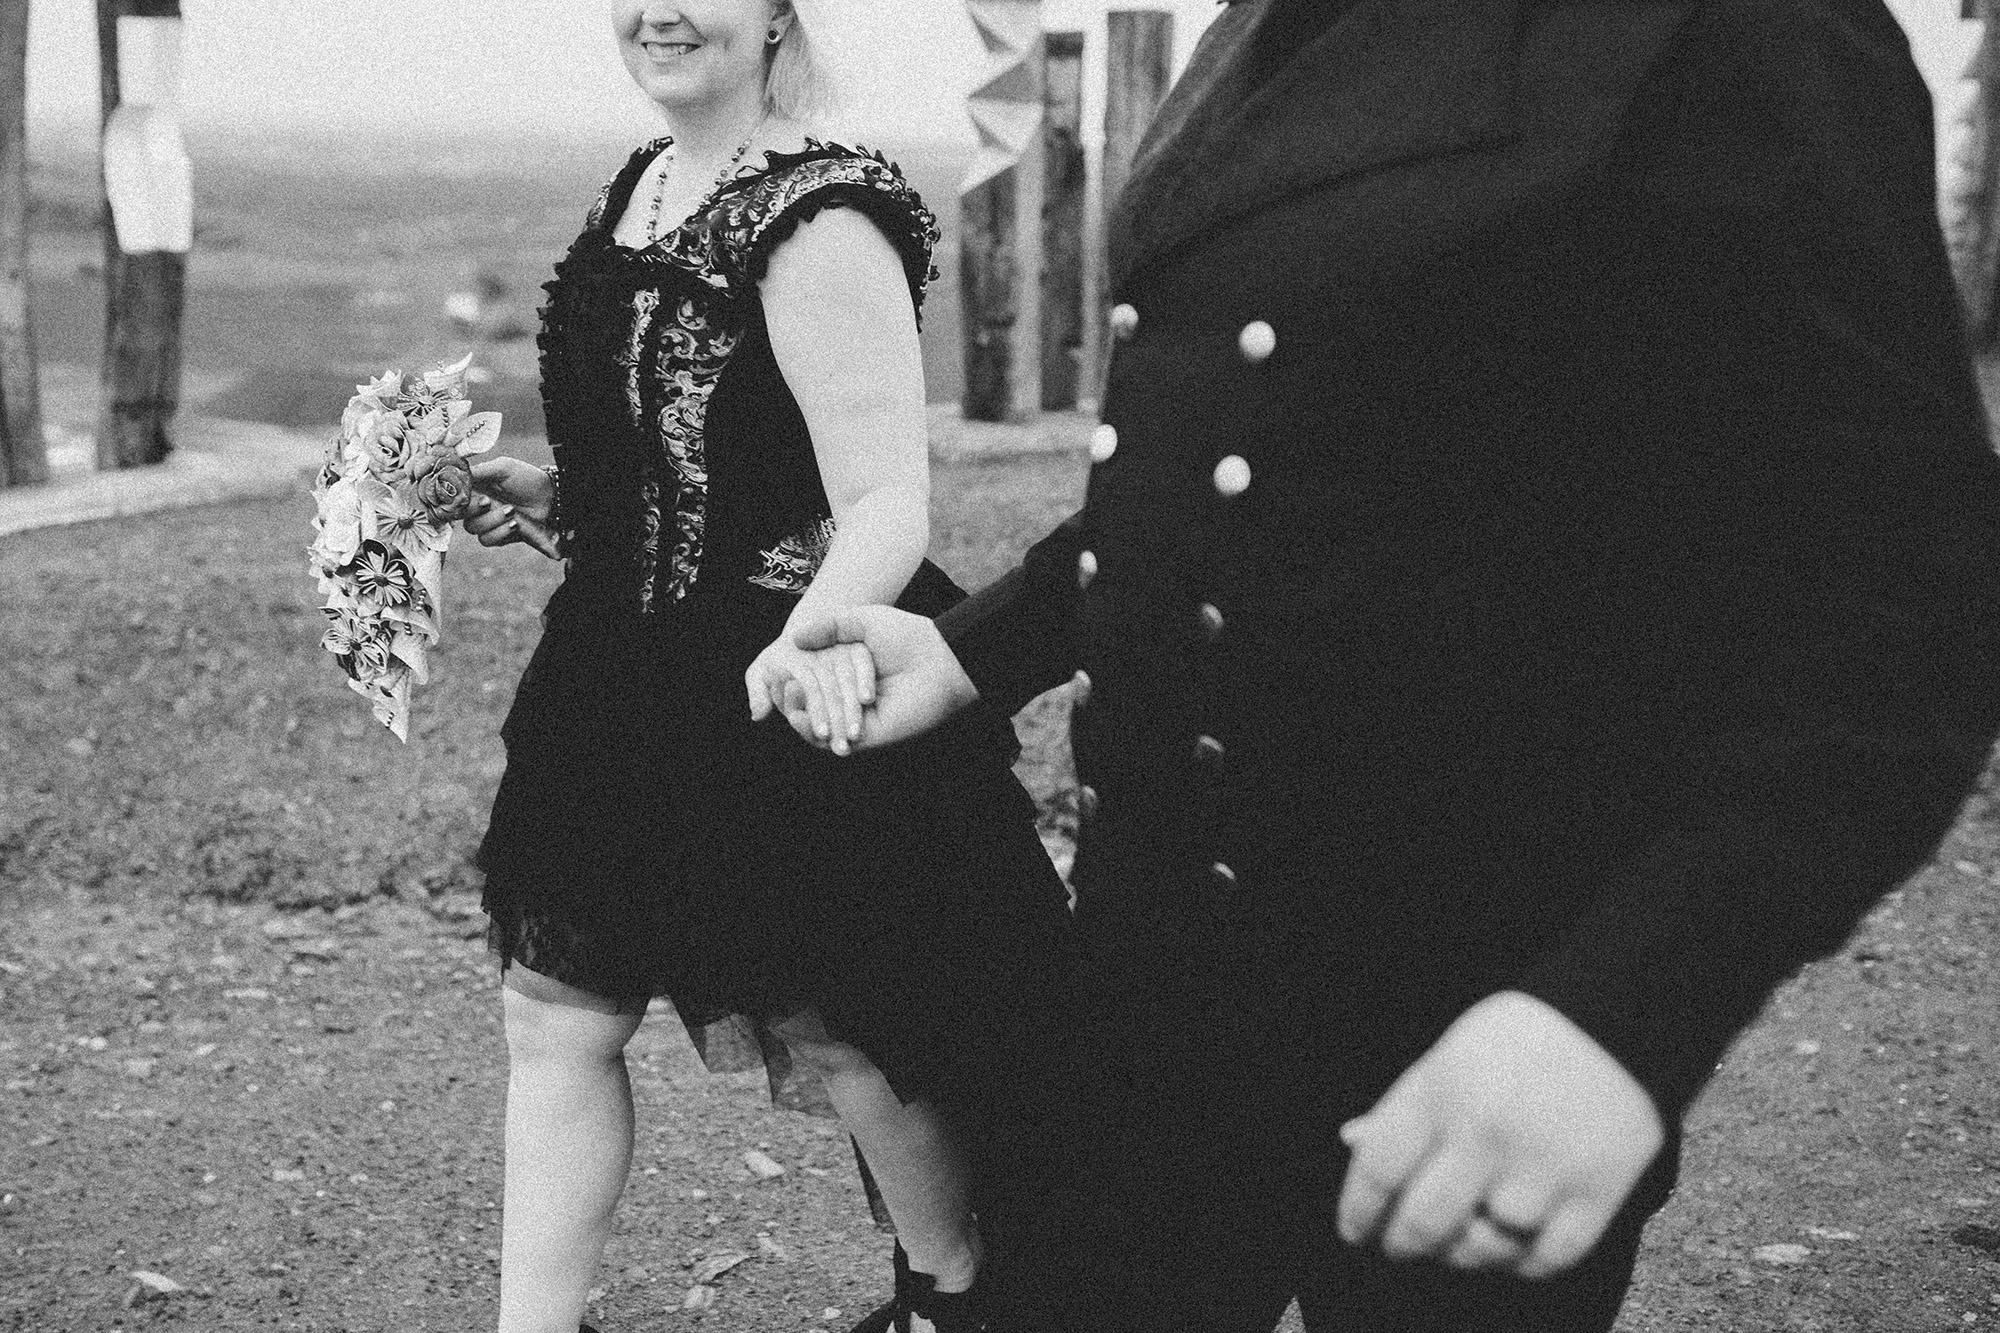 Seriously_Sabrina_Photography_Essen_Germany_RocknRoll_Hochzeit_Wedding_PatrickJenny189.jpg